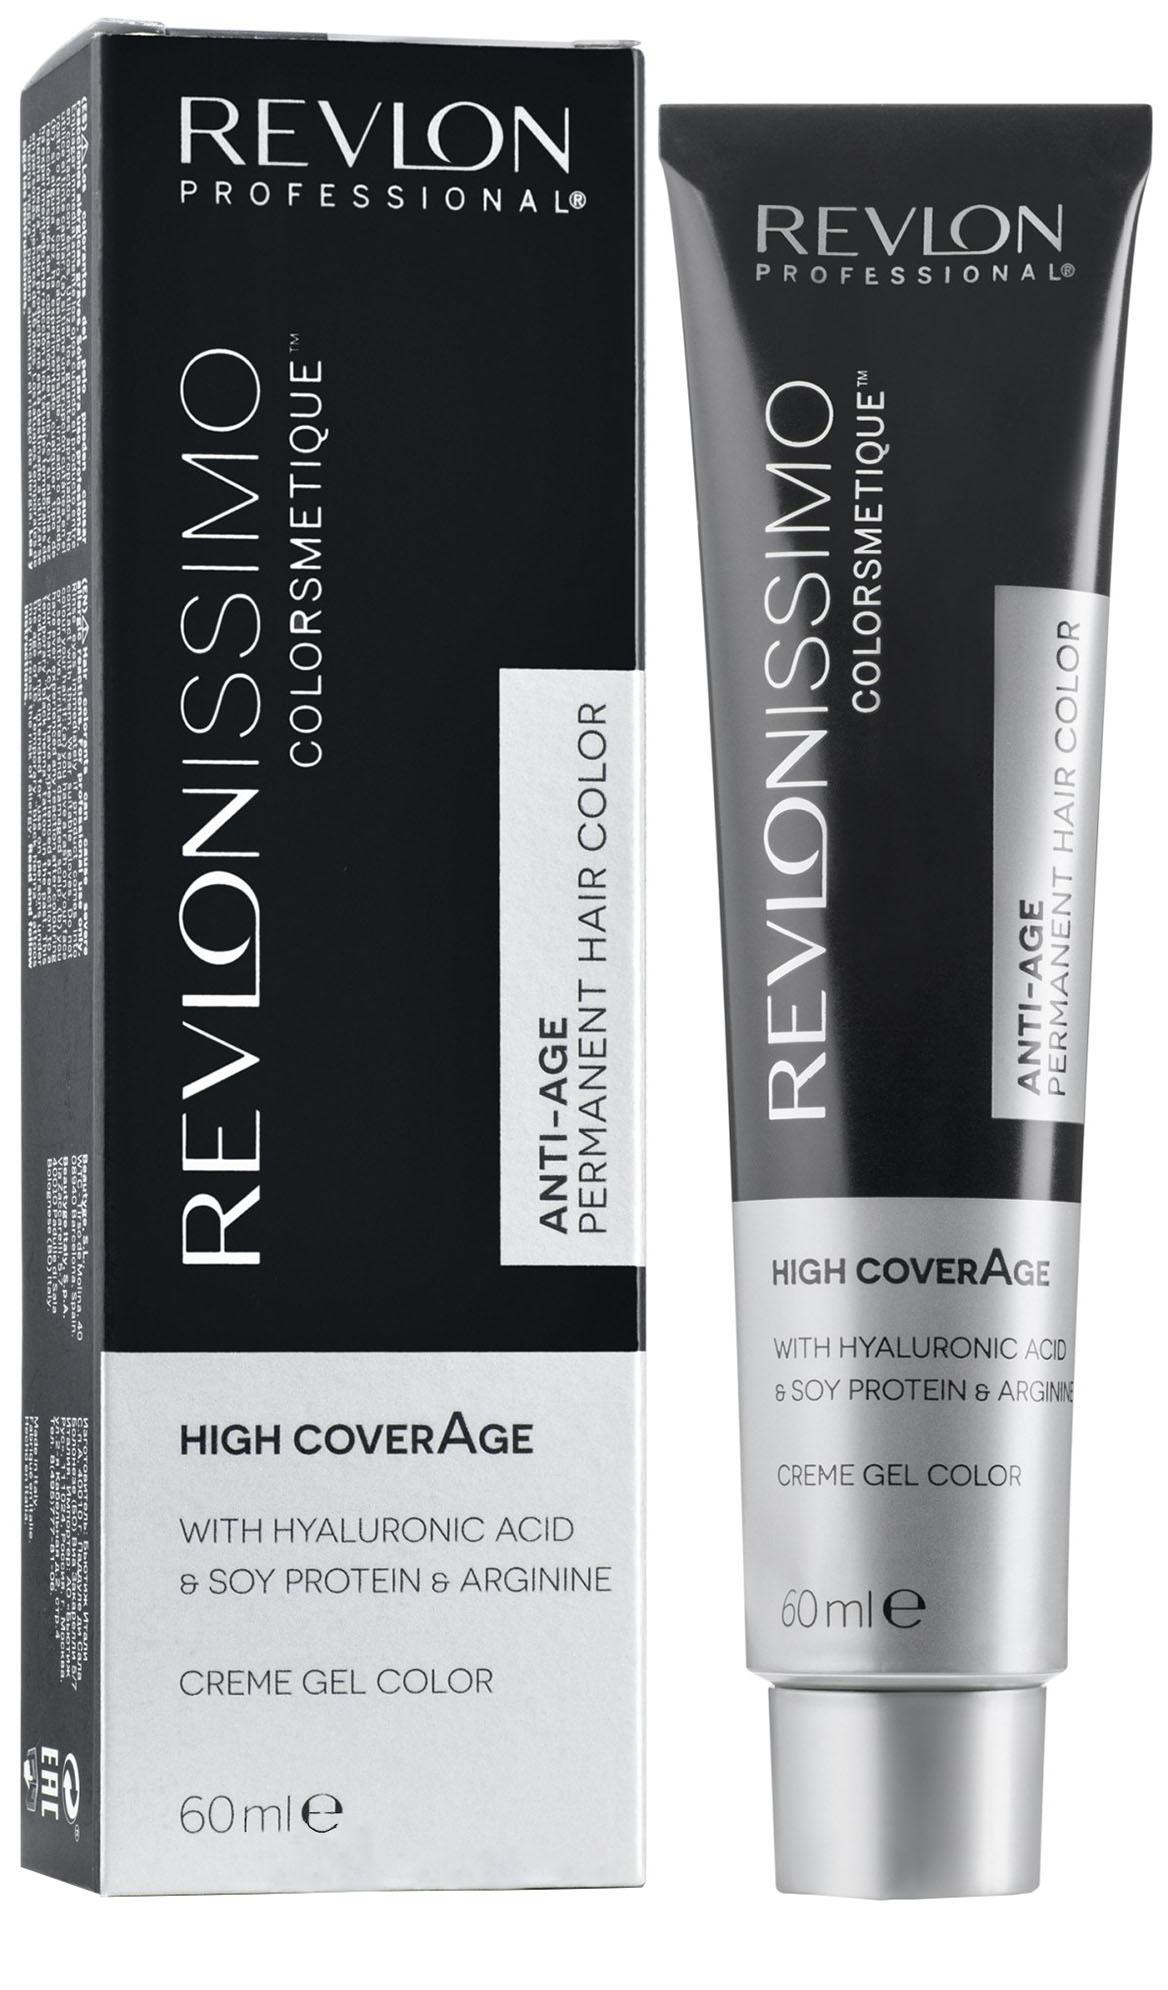 Краска для волос Revlonissimo Colorsmetique High Coverage 7-35 Янтарный блондин, 60мл